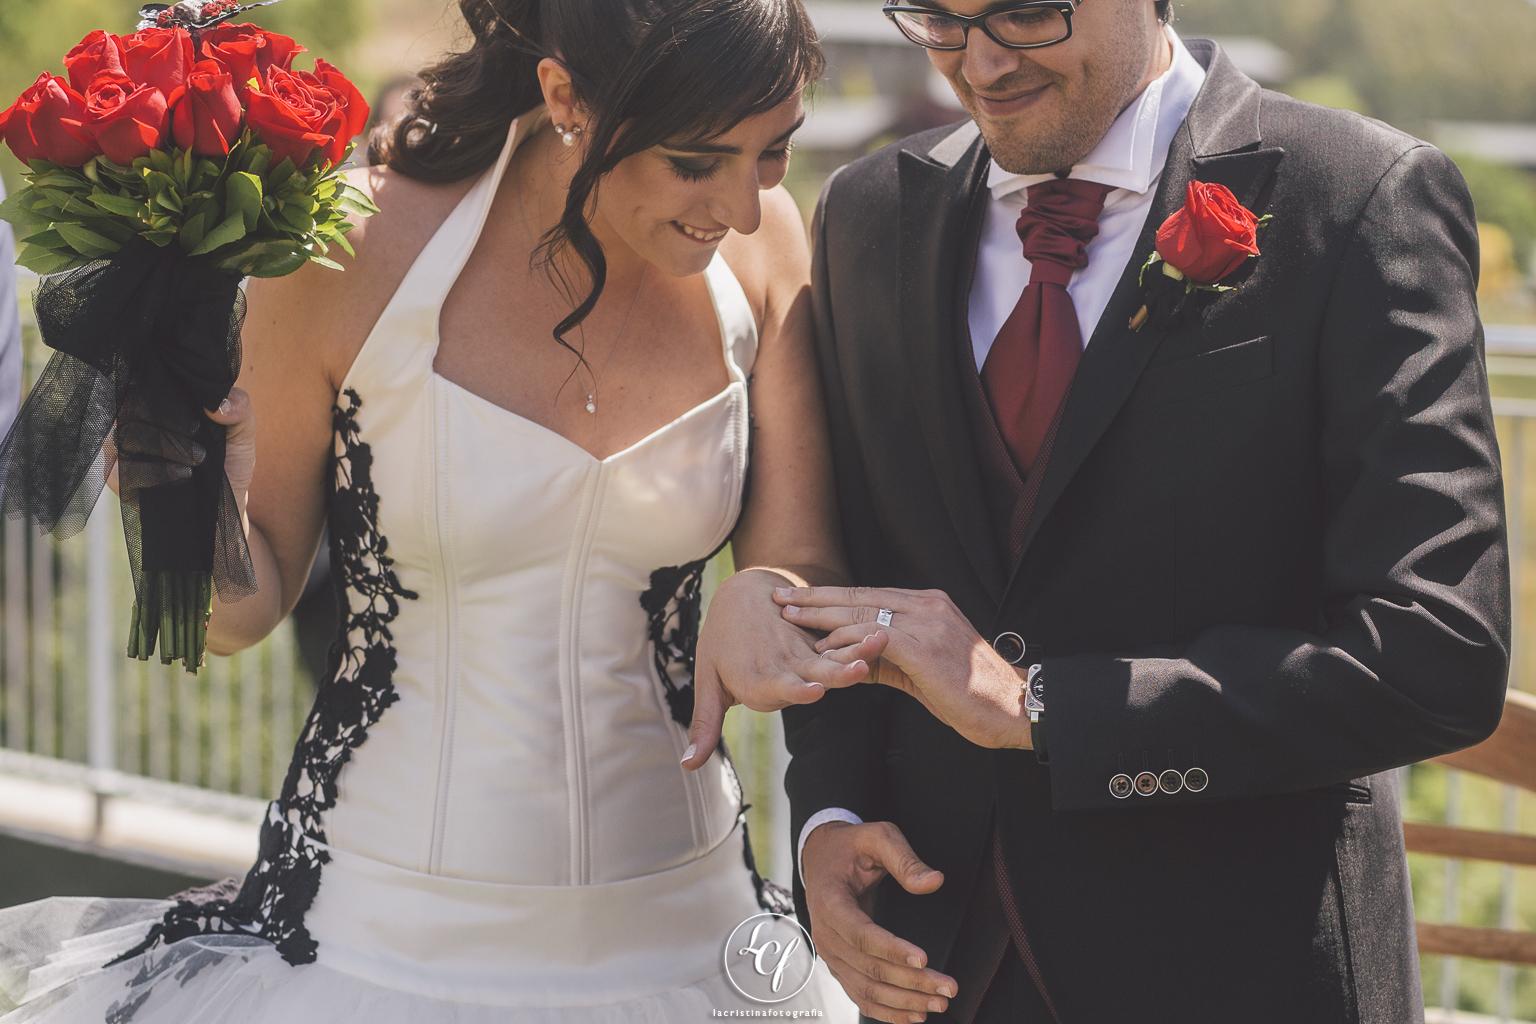 fotógrafo de boda pirineos :: Fotógrafo de bodas natural :: fotógrafo de bodas montaña :: fotógrafo boda cerdanya :: Prullans